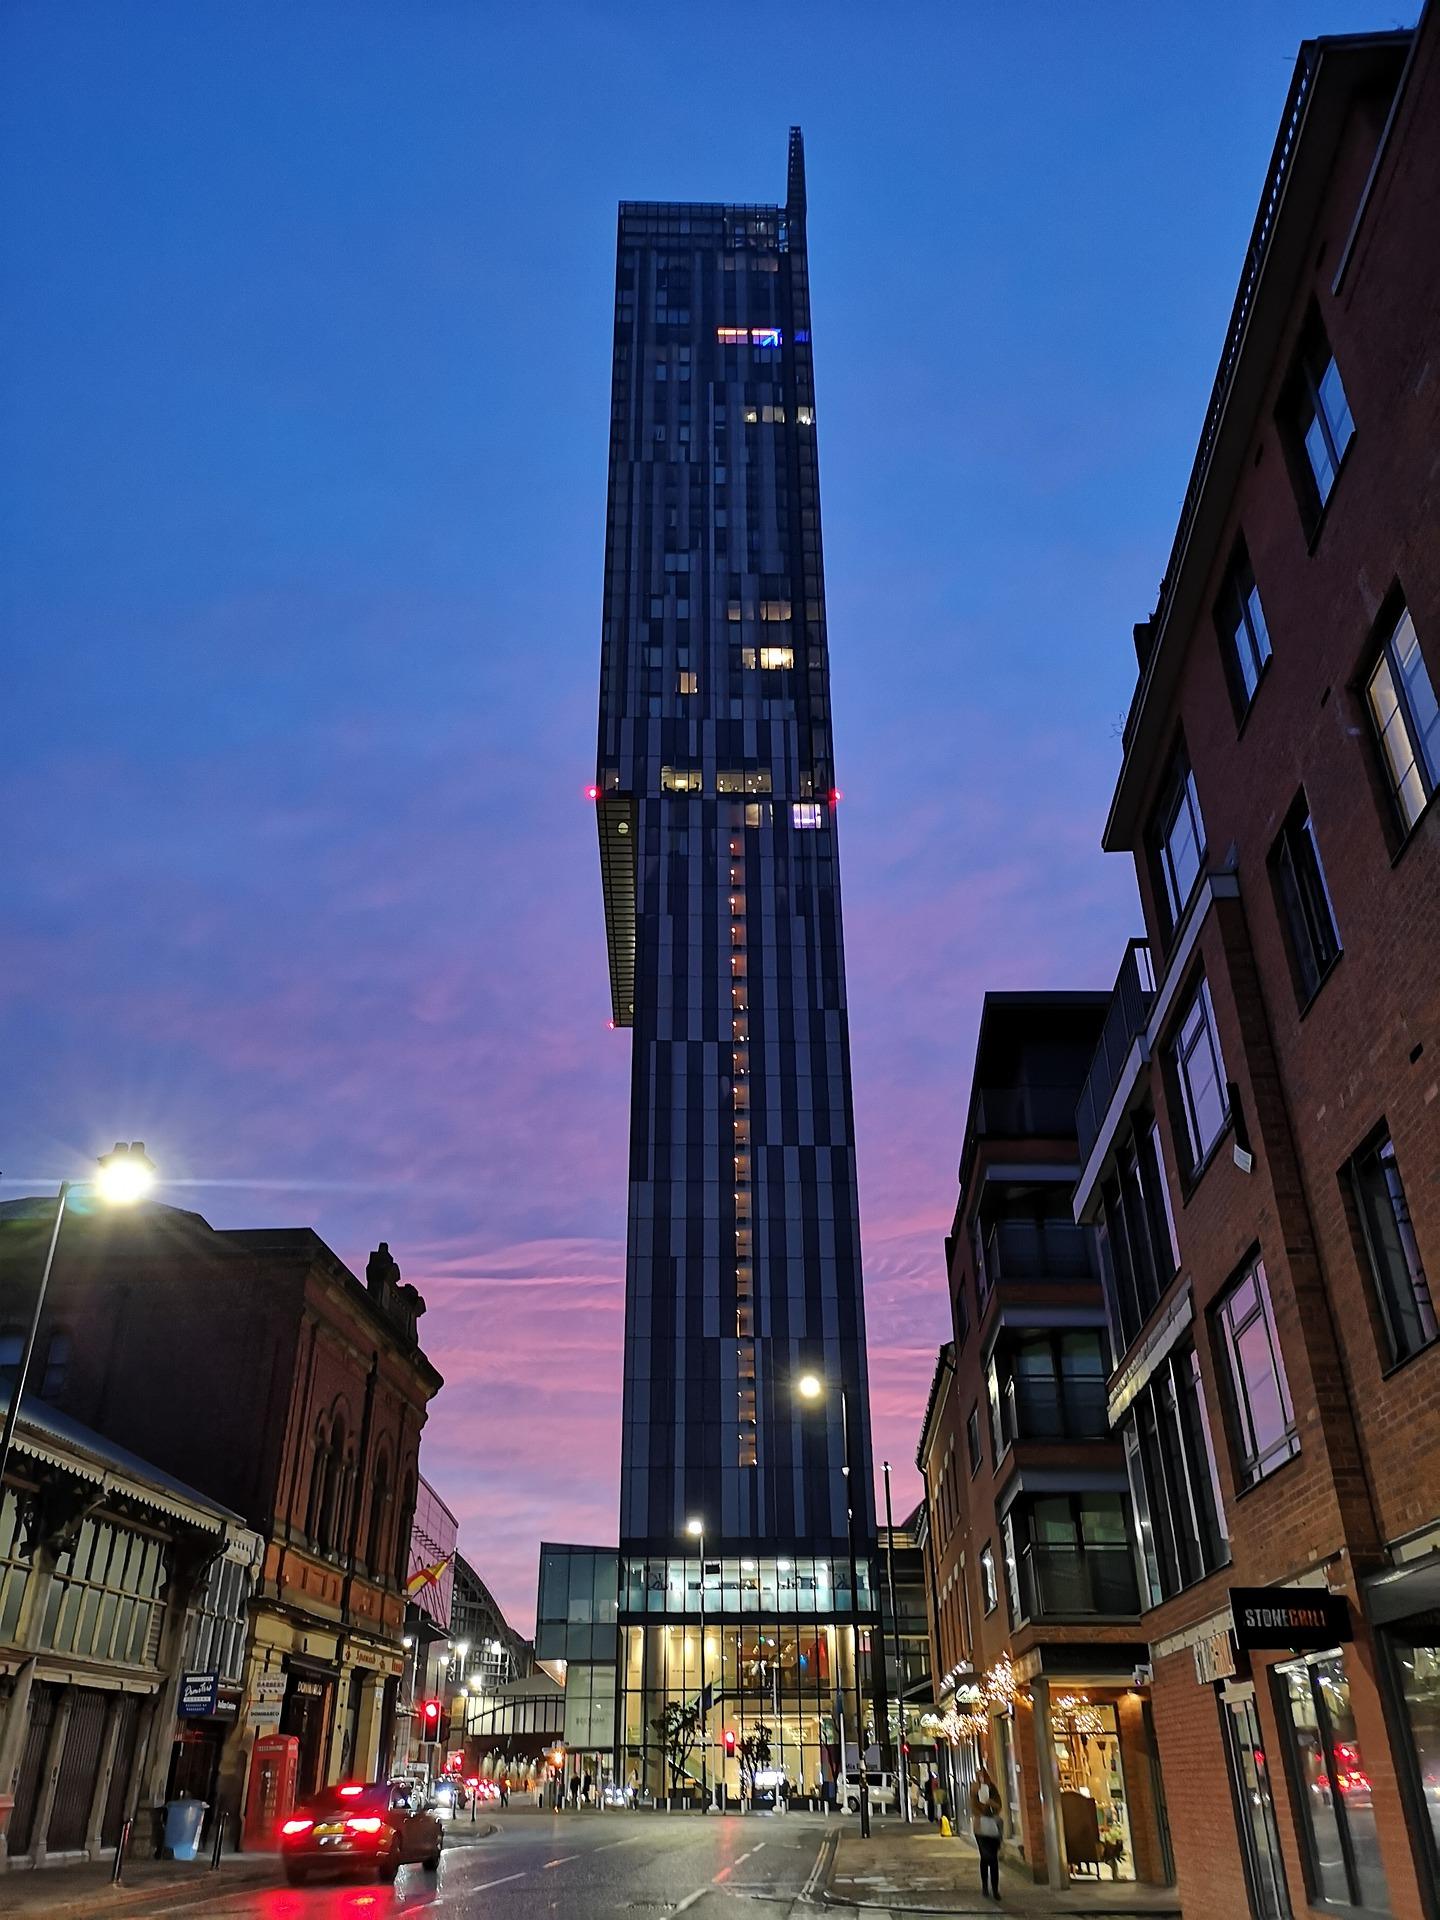 manchester-city-centre-4681971_1920